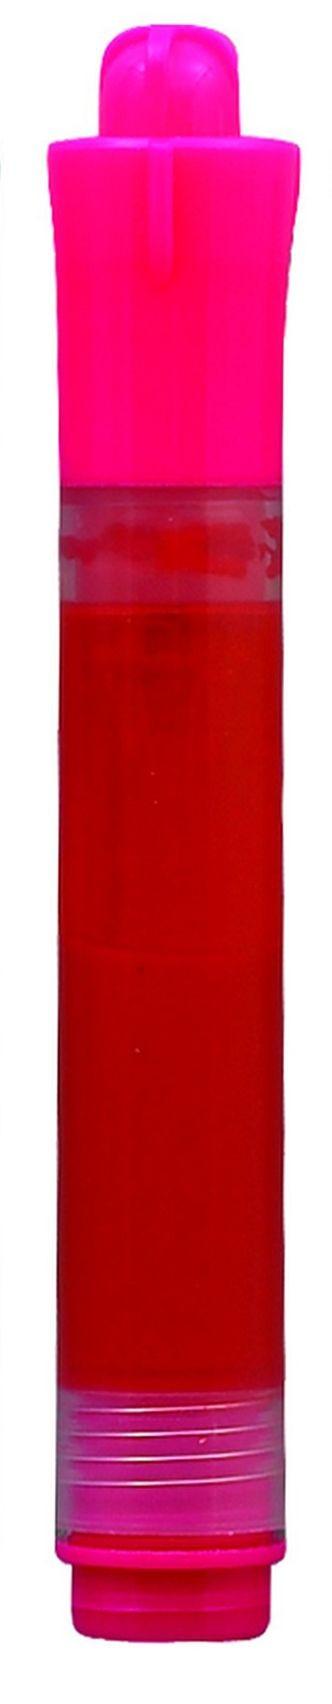 Deluxe Neon Marker, Red